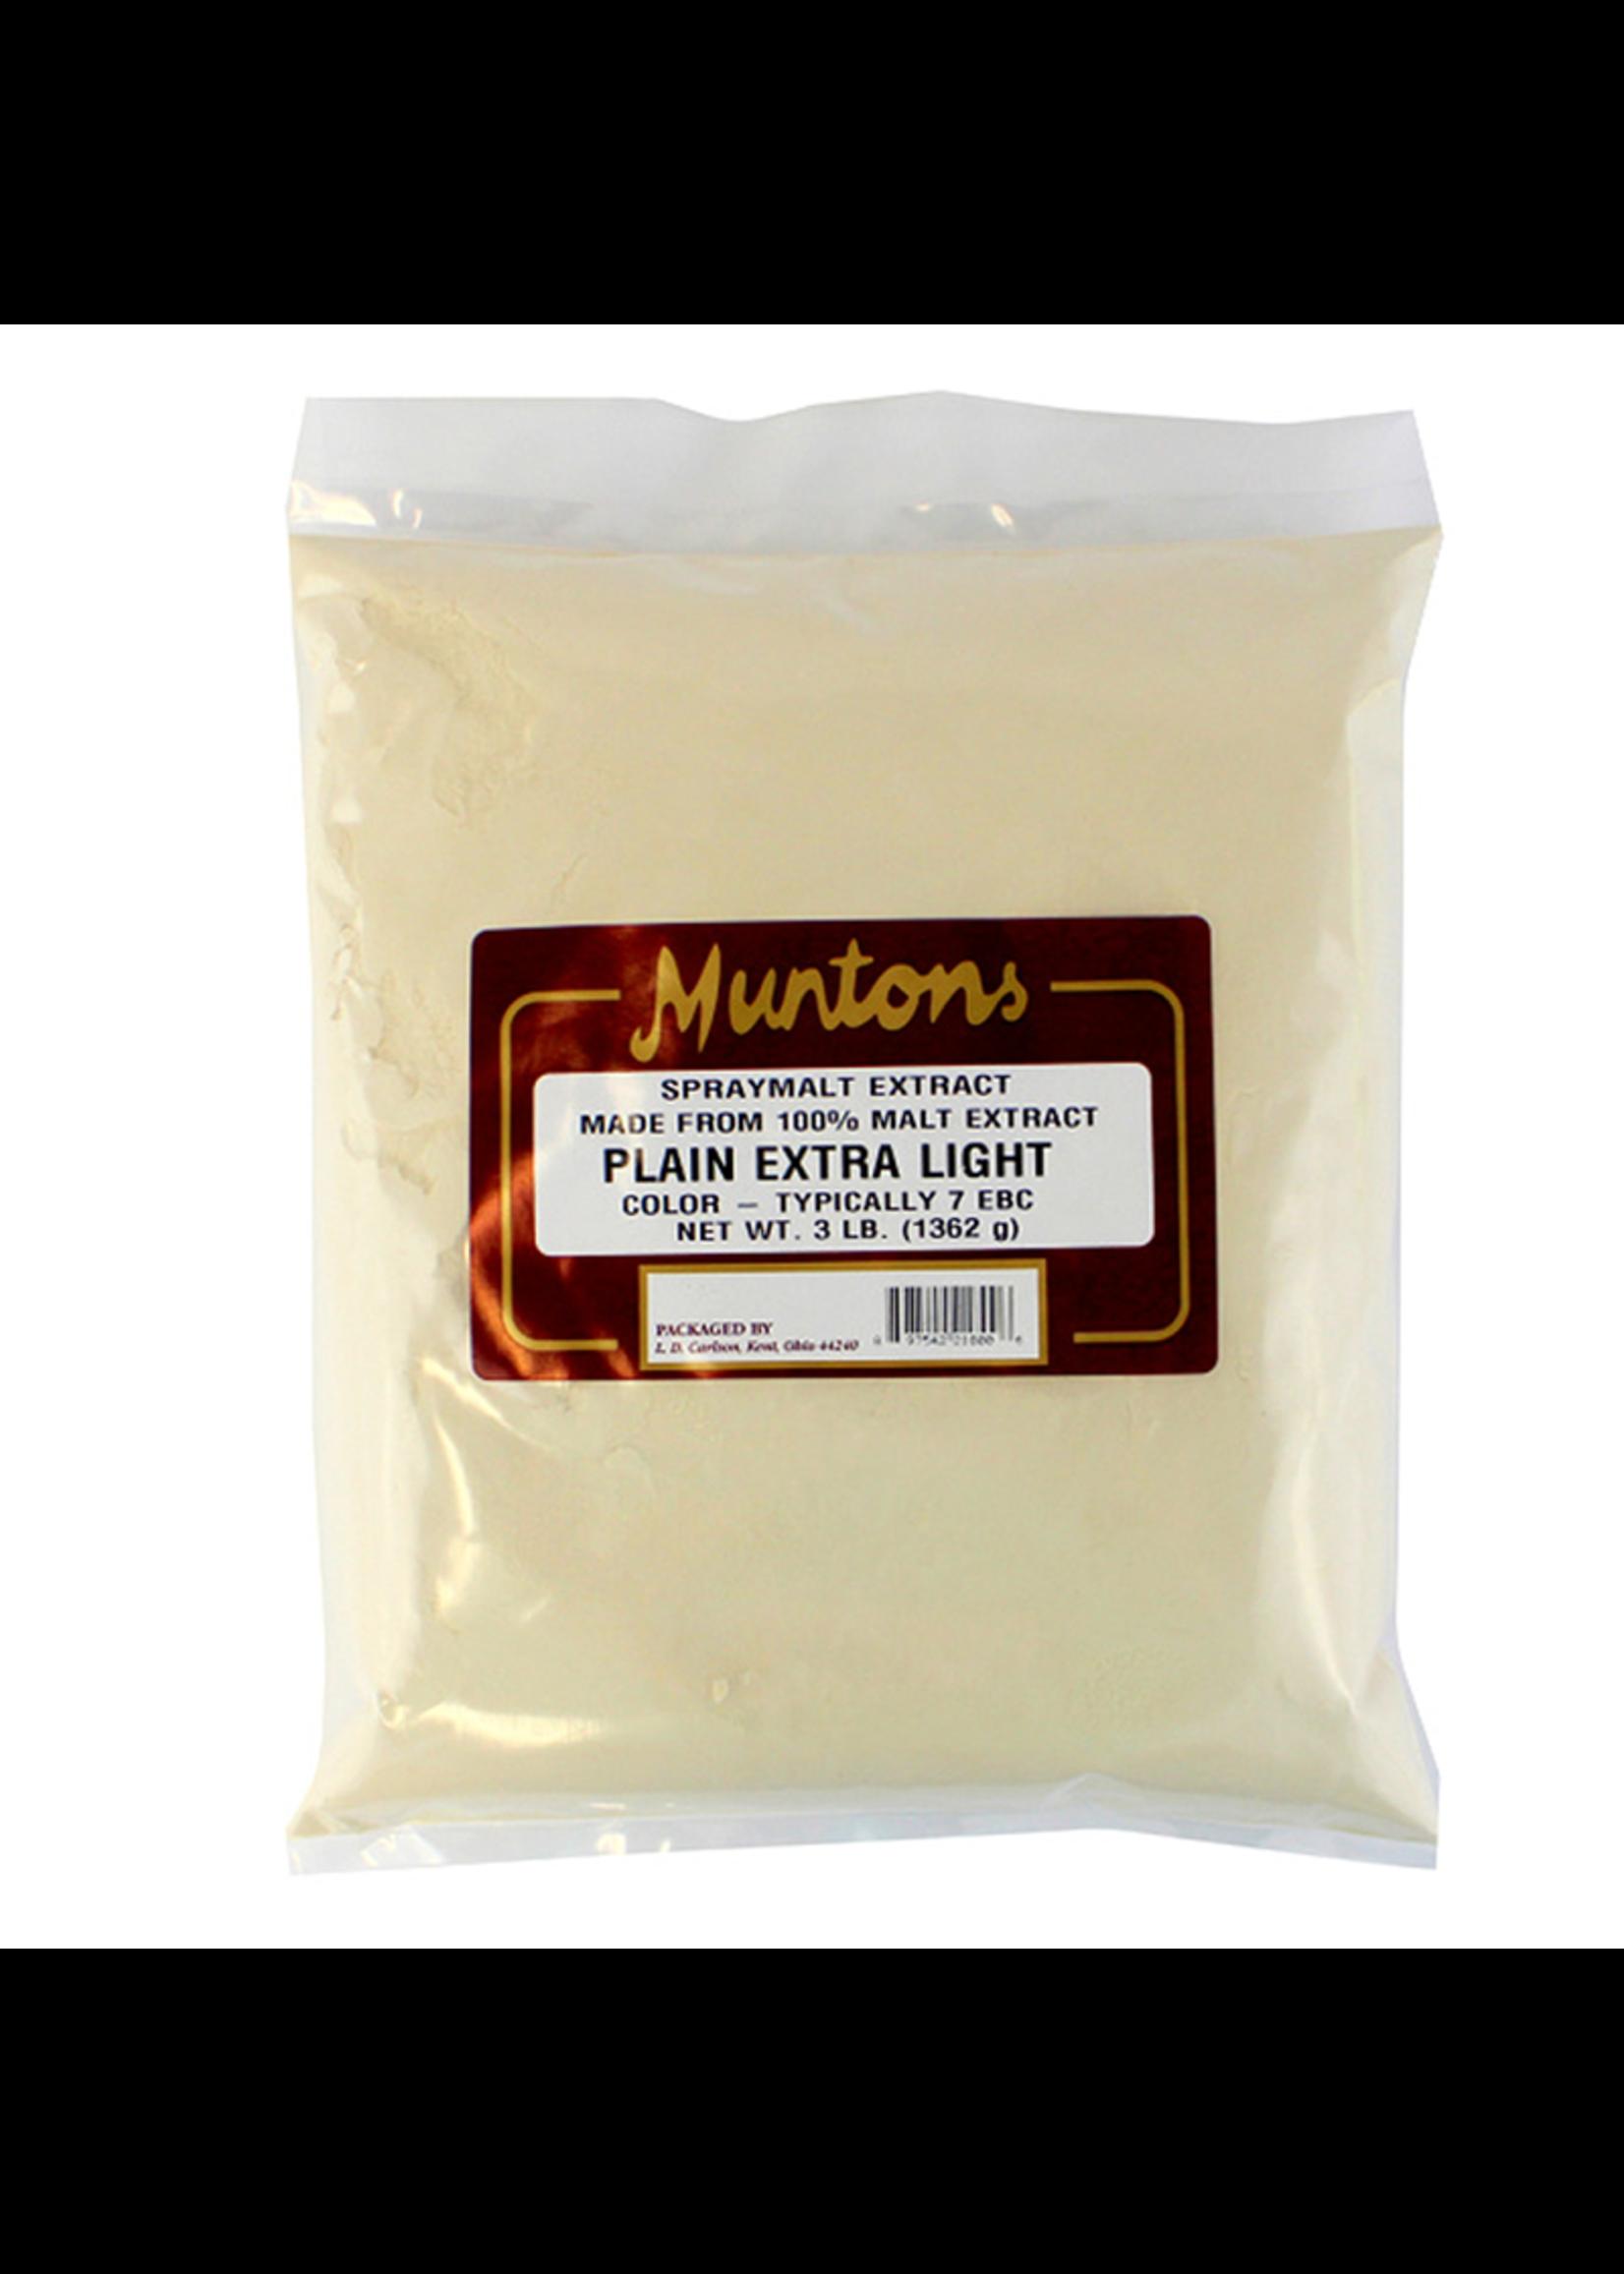 Extracts/Adjuncts Muntons Plain Extra Light Spraymalt Dry Malt Extract (DME) - 3 LB